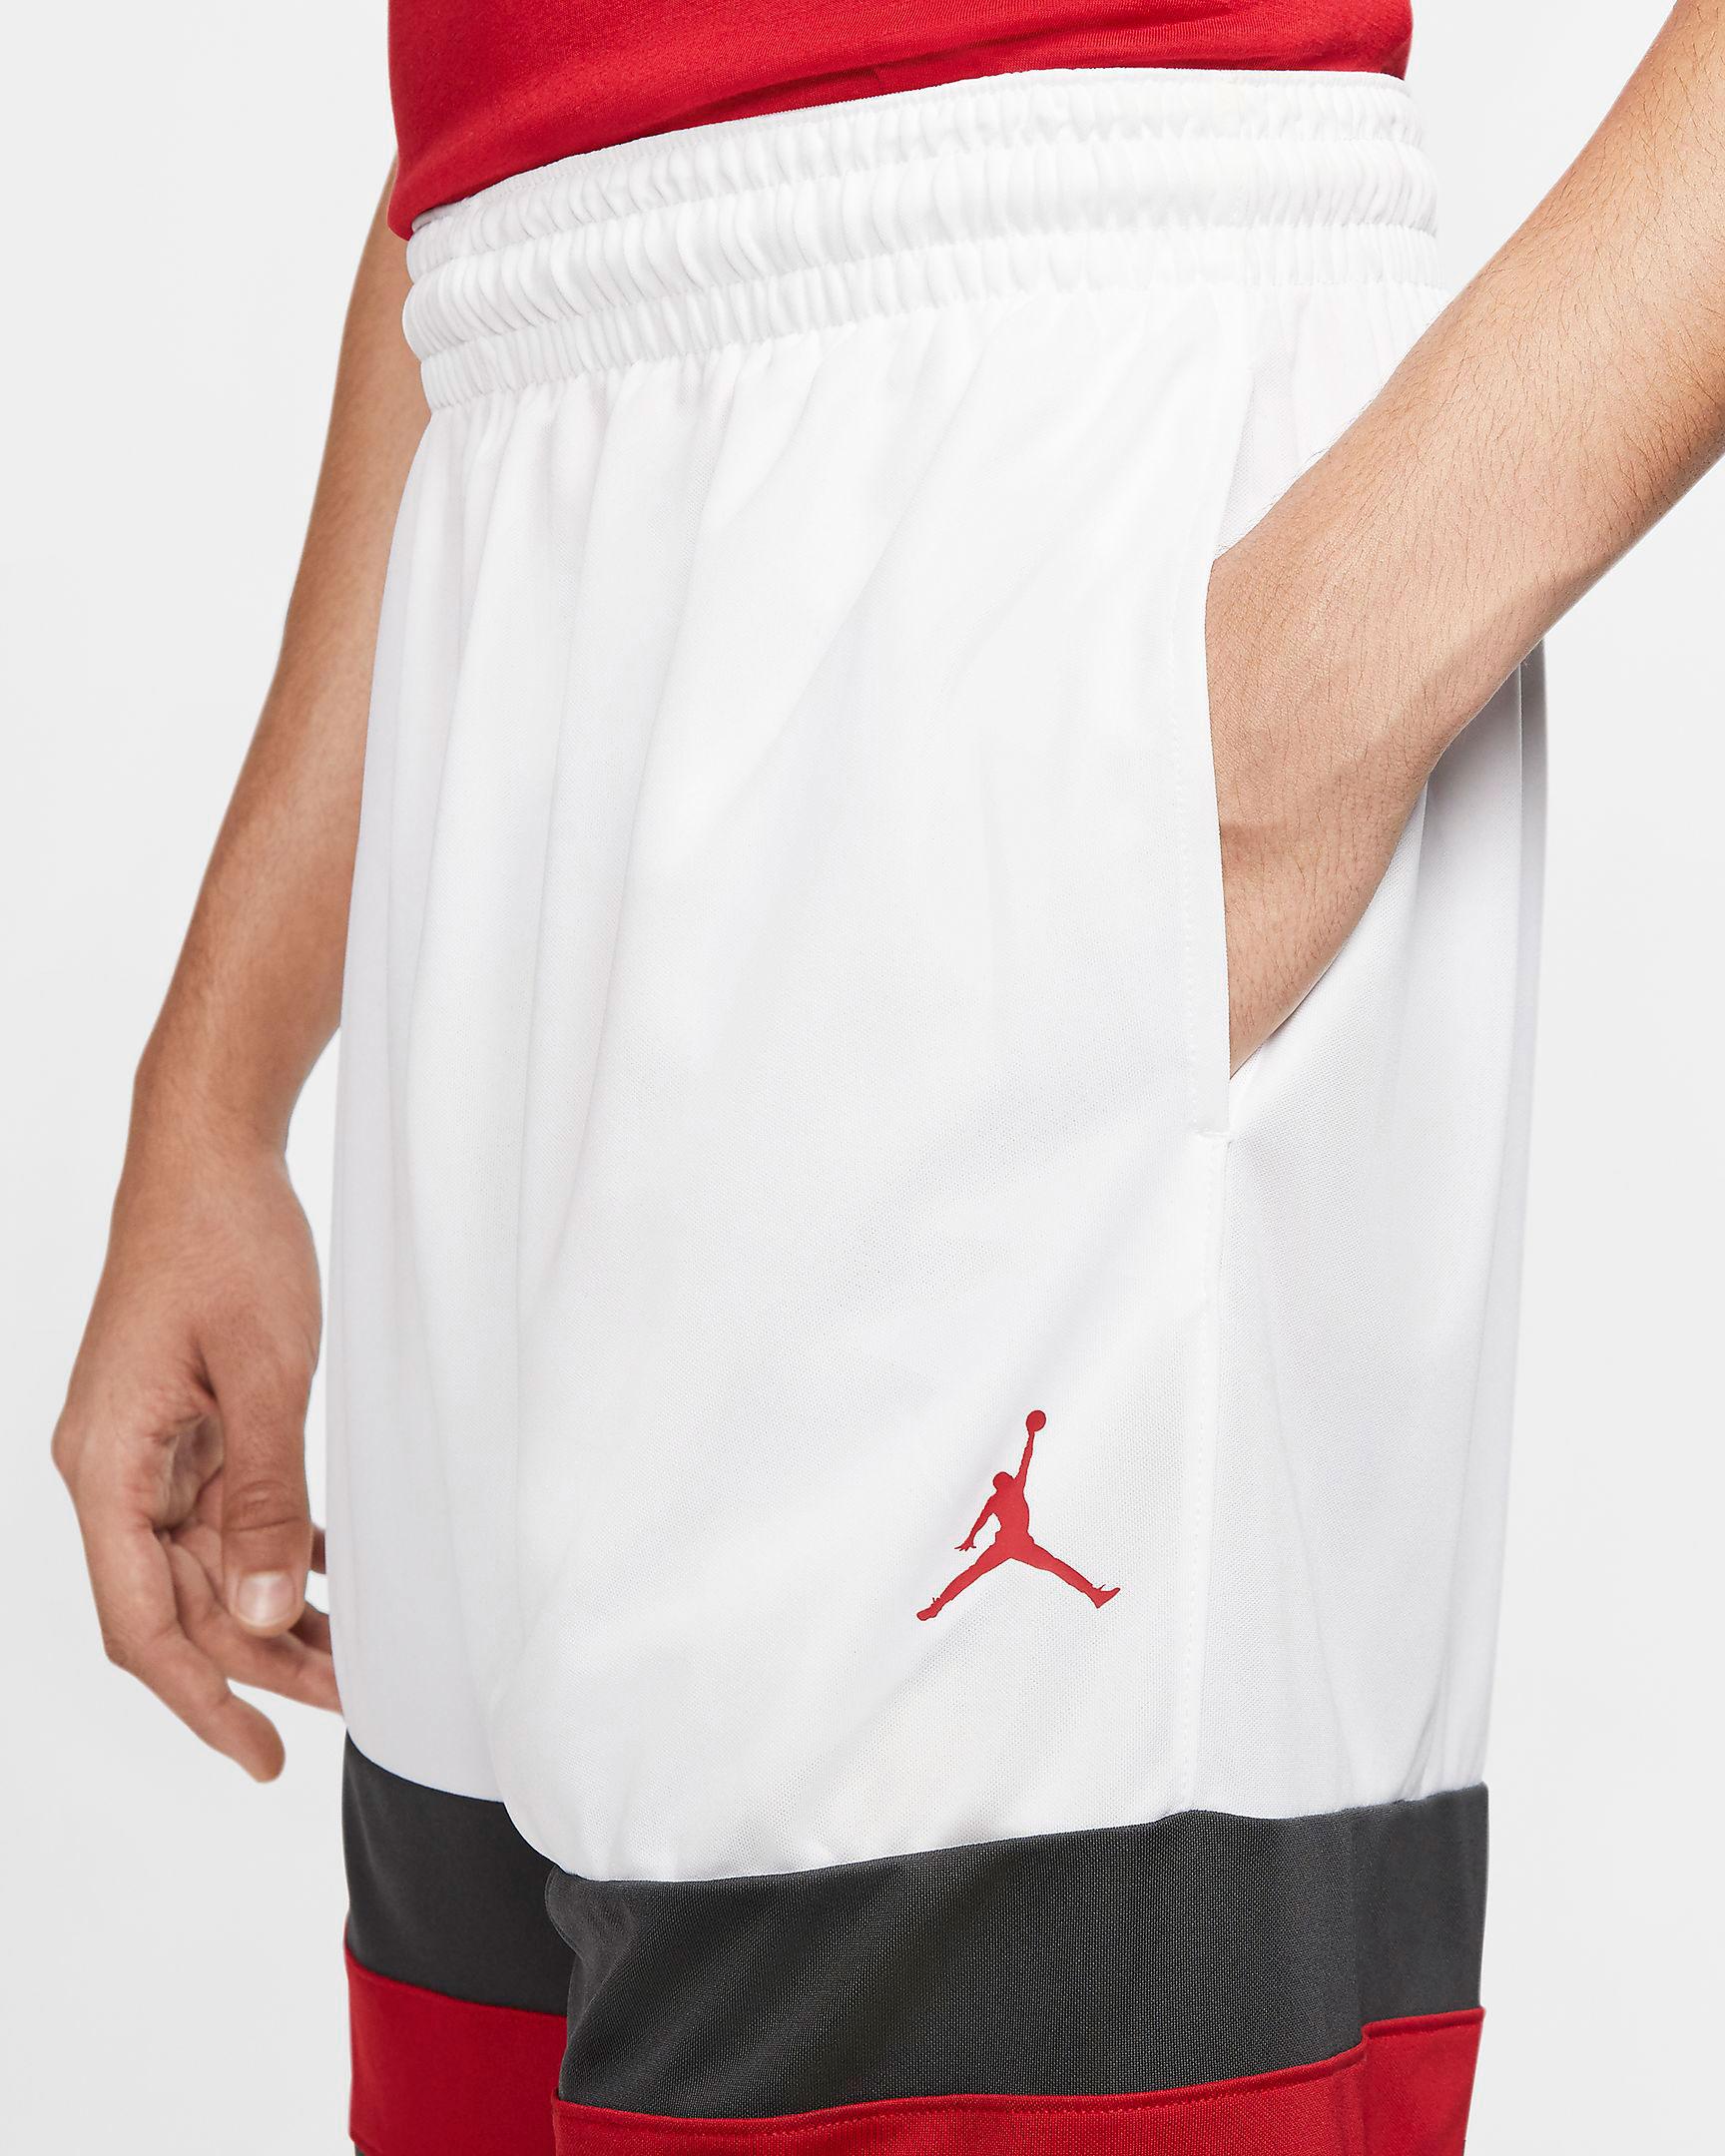 air-jordan-4-metallic-red-shorts-2